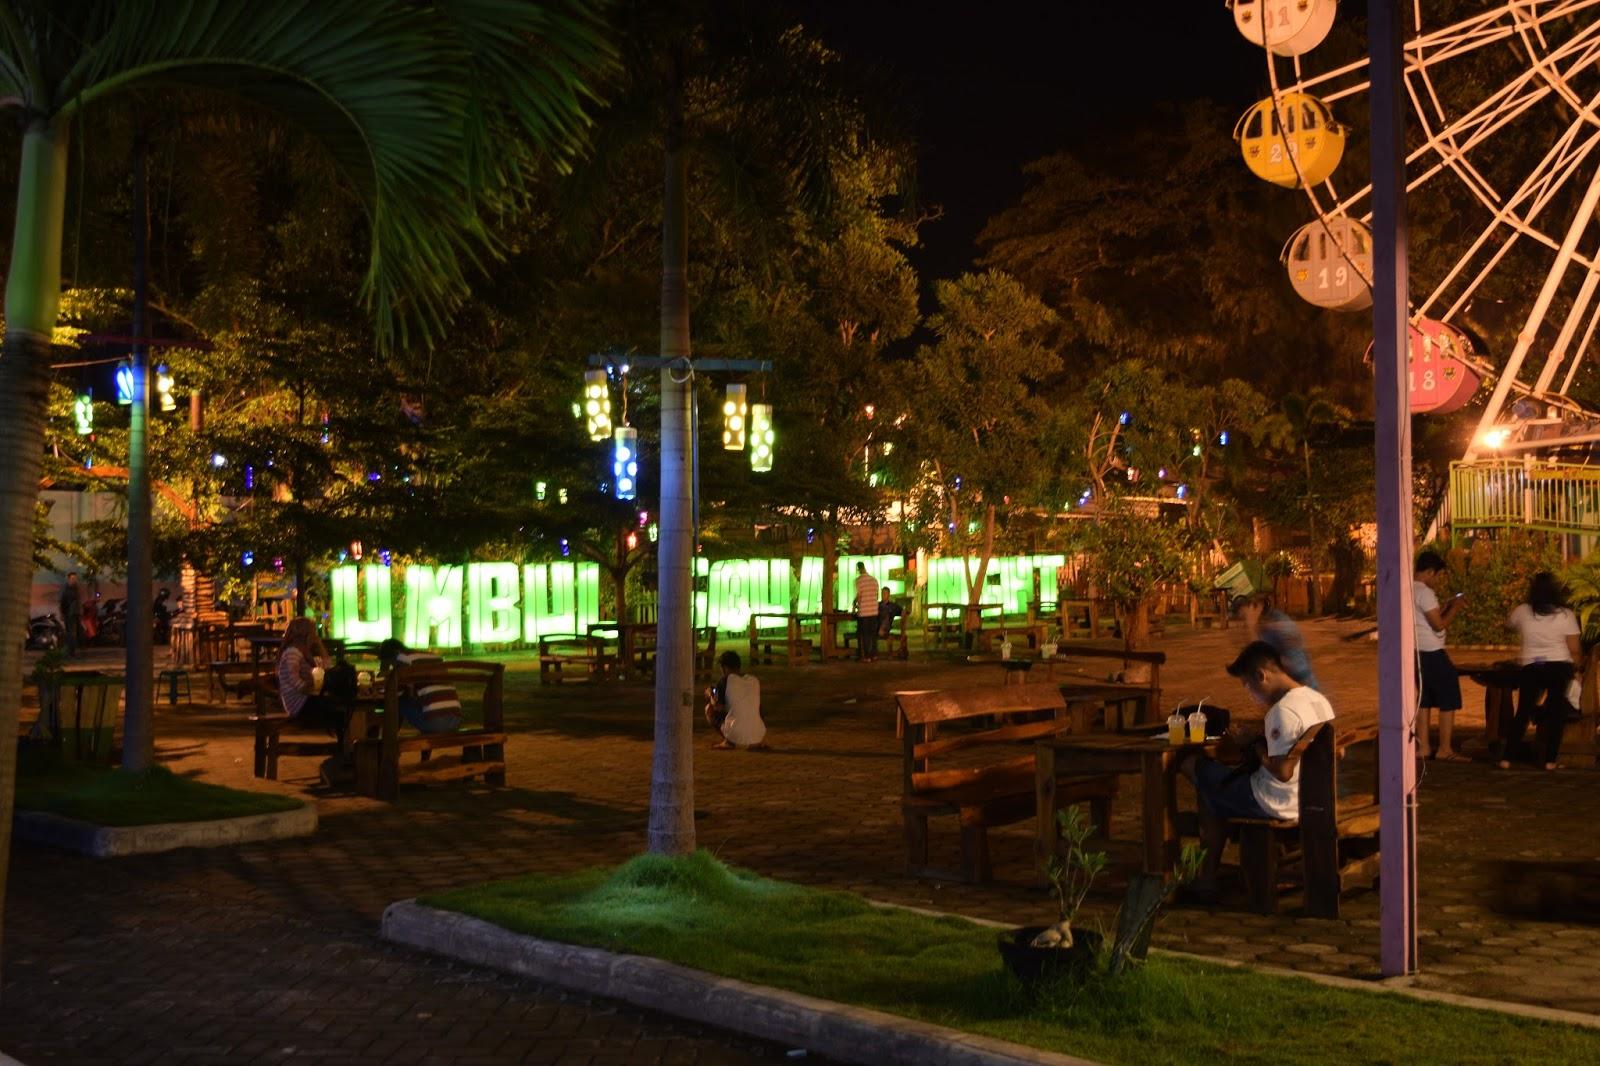 7 Wisata Malam Madiun Recommended Umbul Square Night Festival Alun